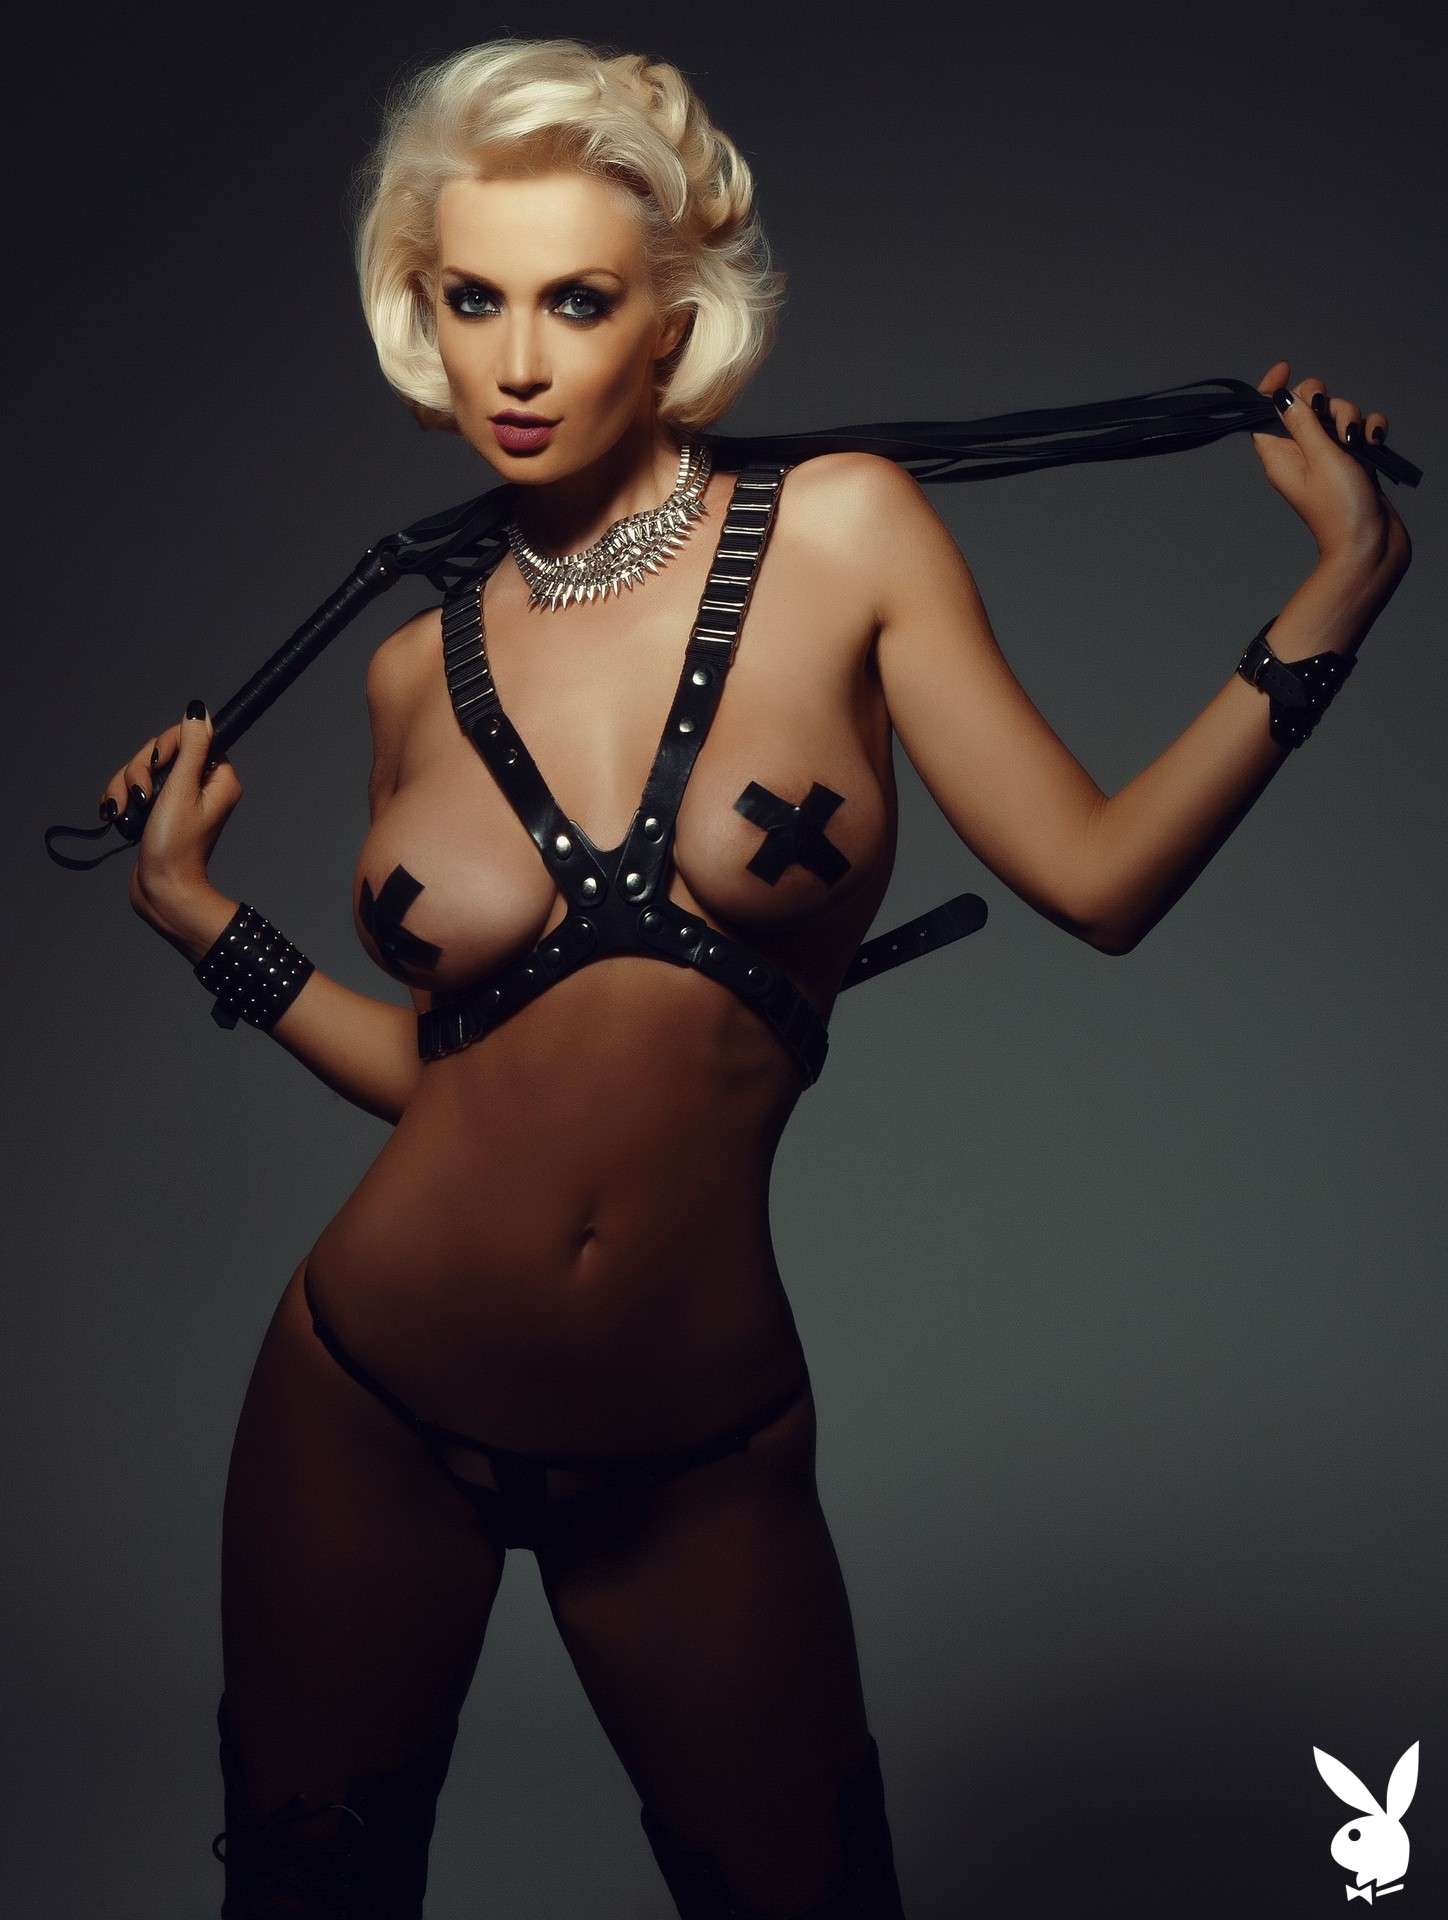 Bondage, Harness, Nipple Pasties, Thong, Black Thong, Bdsm, Whip, Black Whip, Fetish